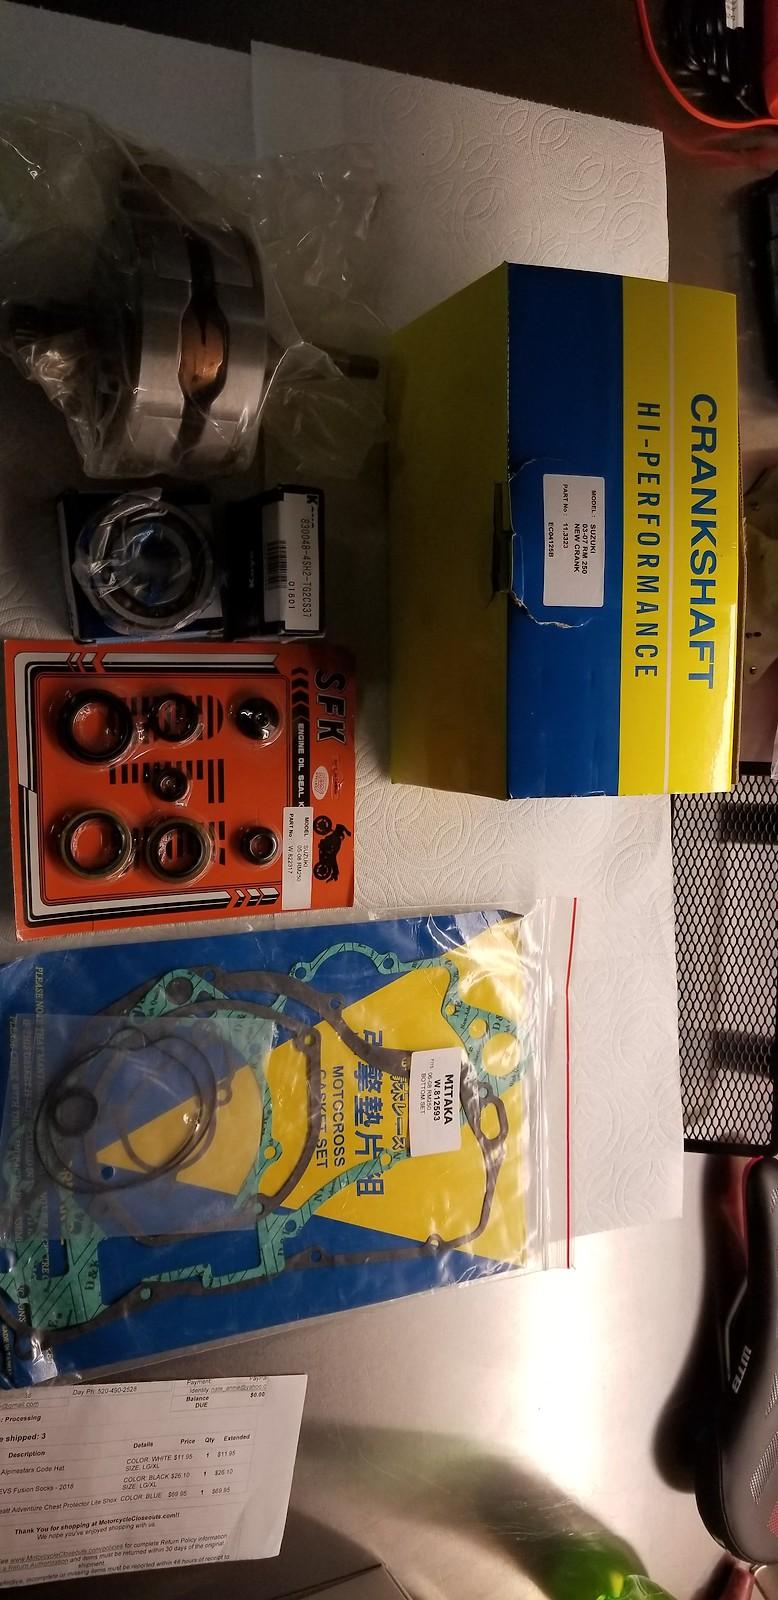 03-07 RM250 Crank Set with SKF seals, Koyo main bearings